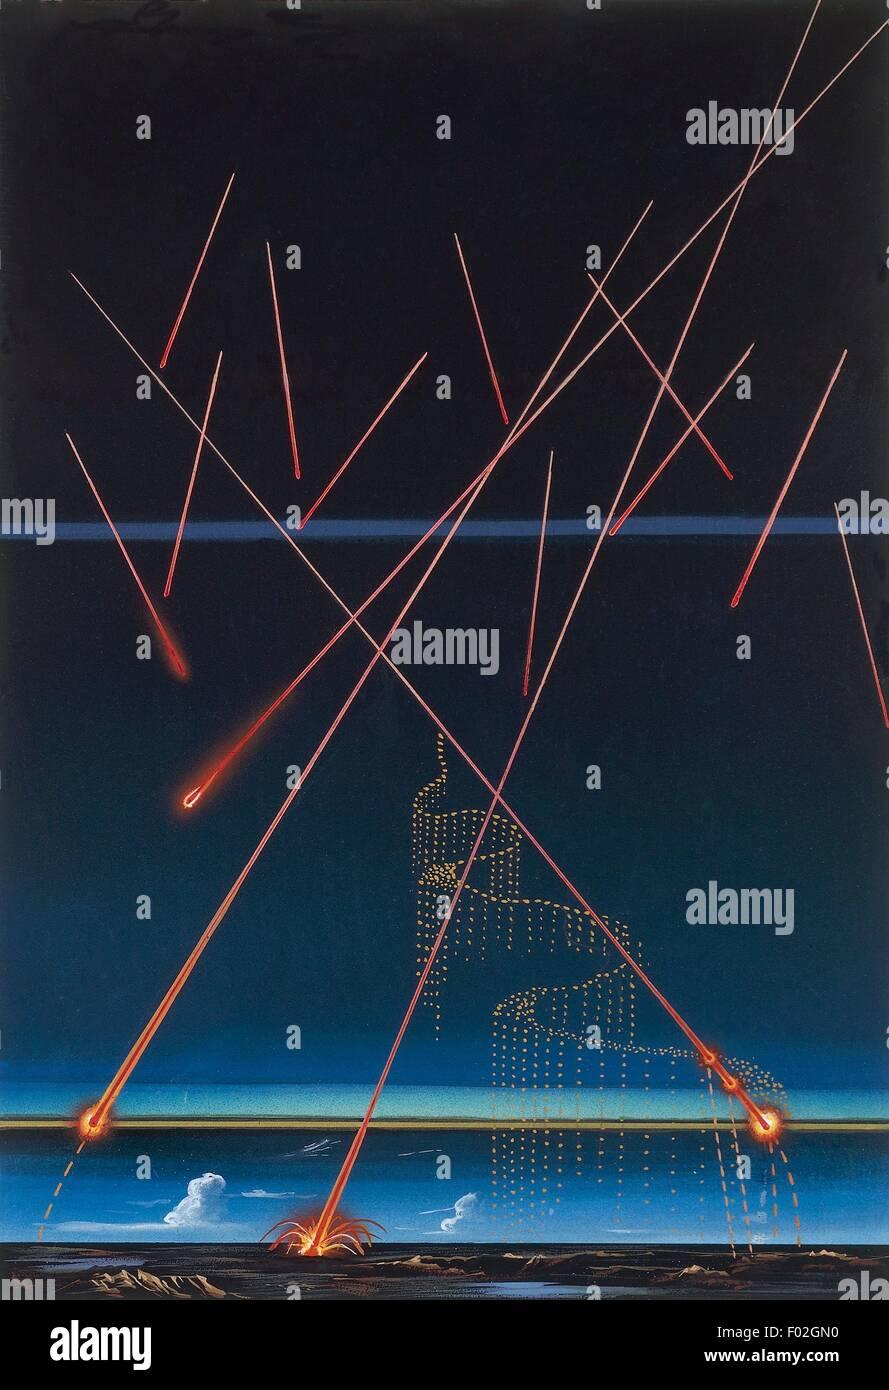 Astronomy - Meteorites trajectories, illustration - Stock Image